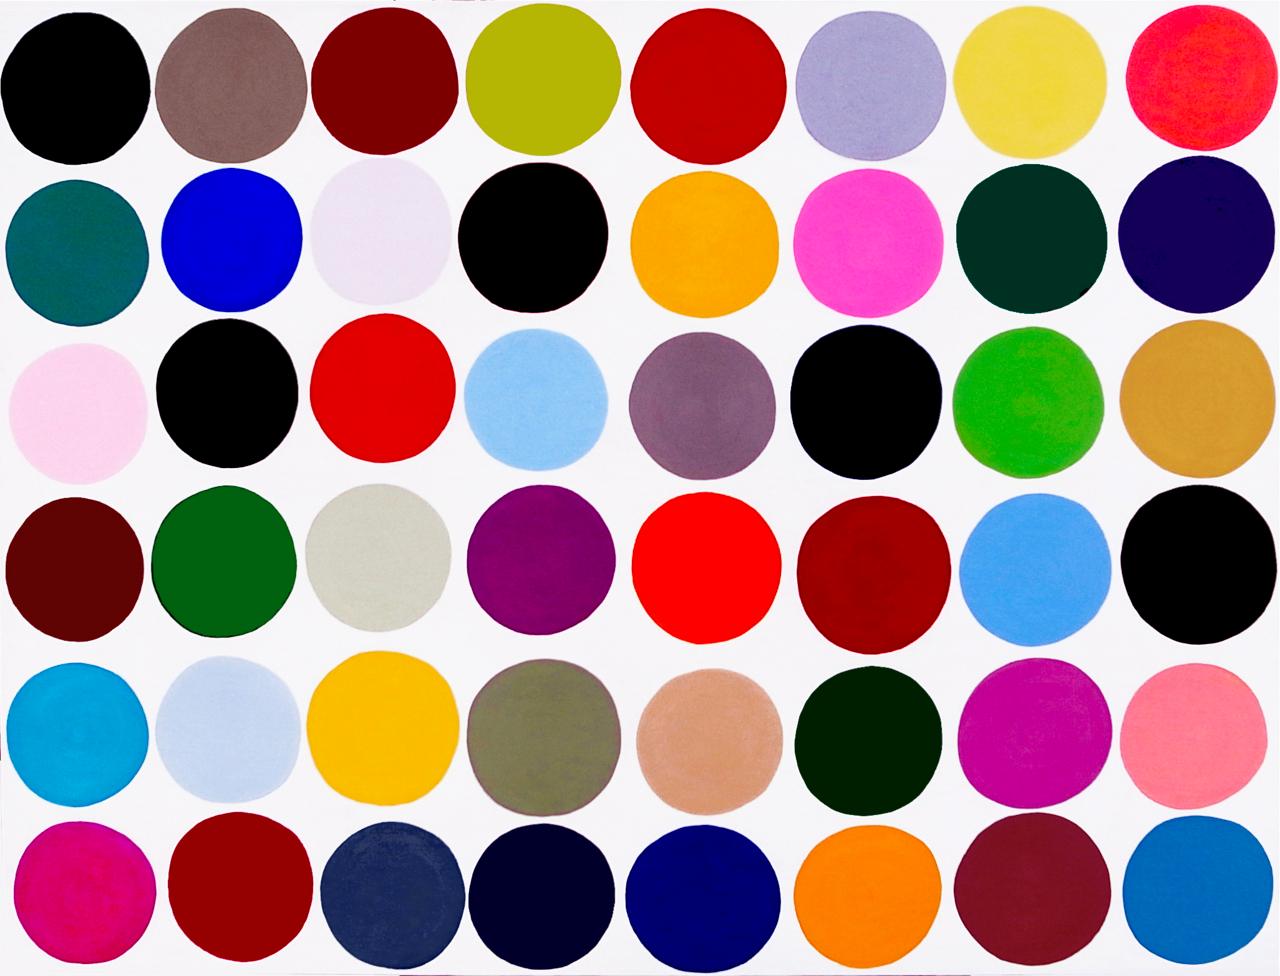 Dots HD wallpapers, Desktop wallpaper - most viewed